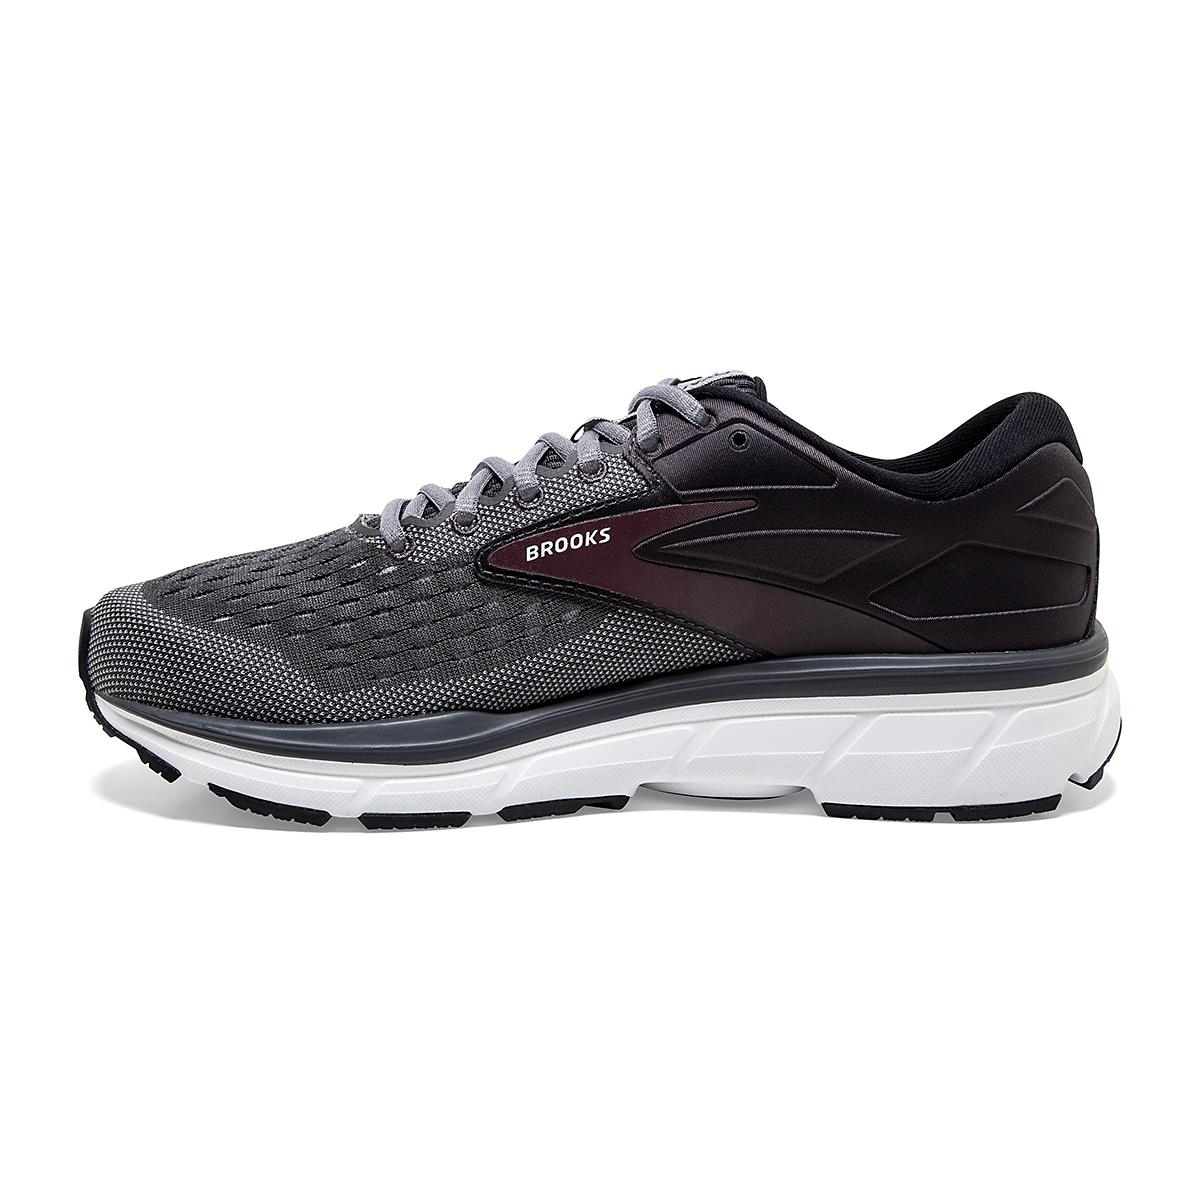 Men's Brooks Dyad 11 Running Shoe - Color: Blackened Pearl  - Size: 7 - Width: Regular, Blackened Pearl, large, image 2